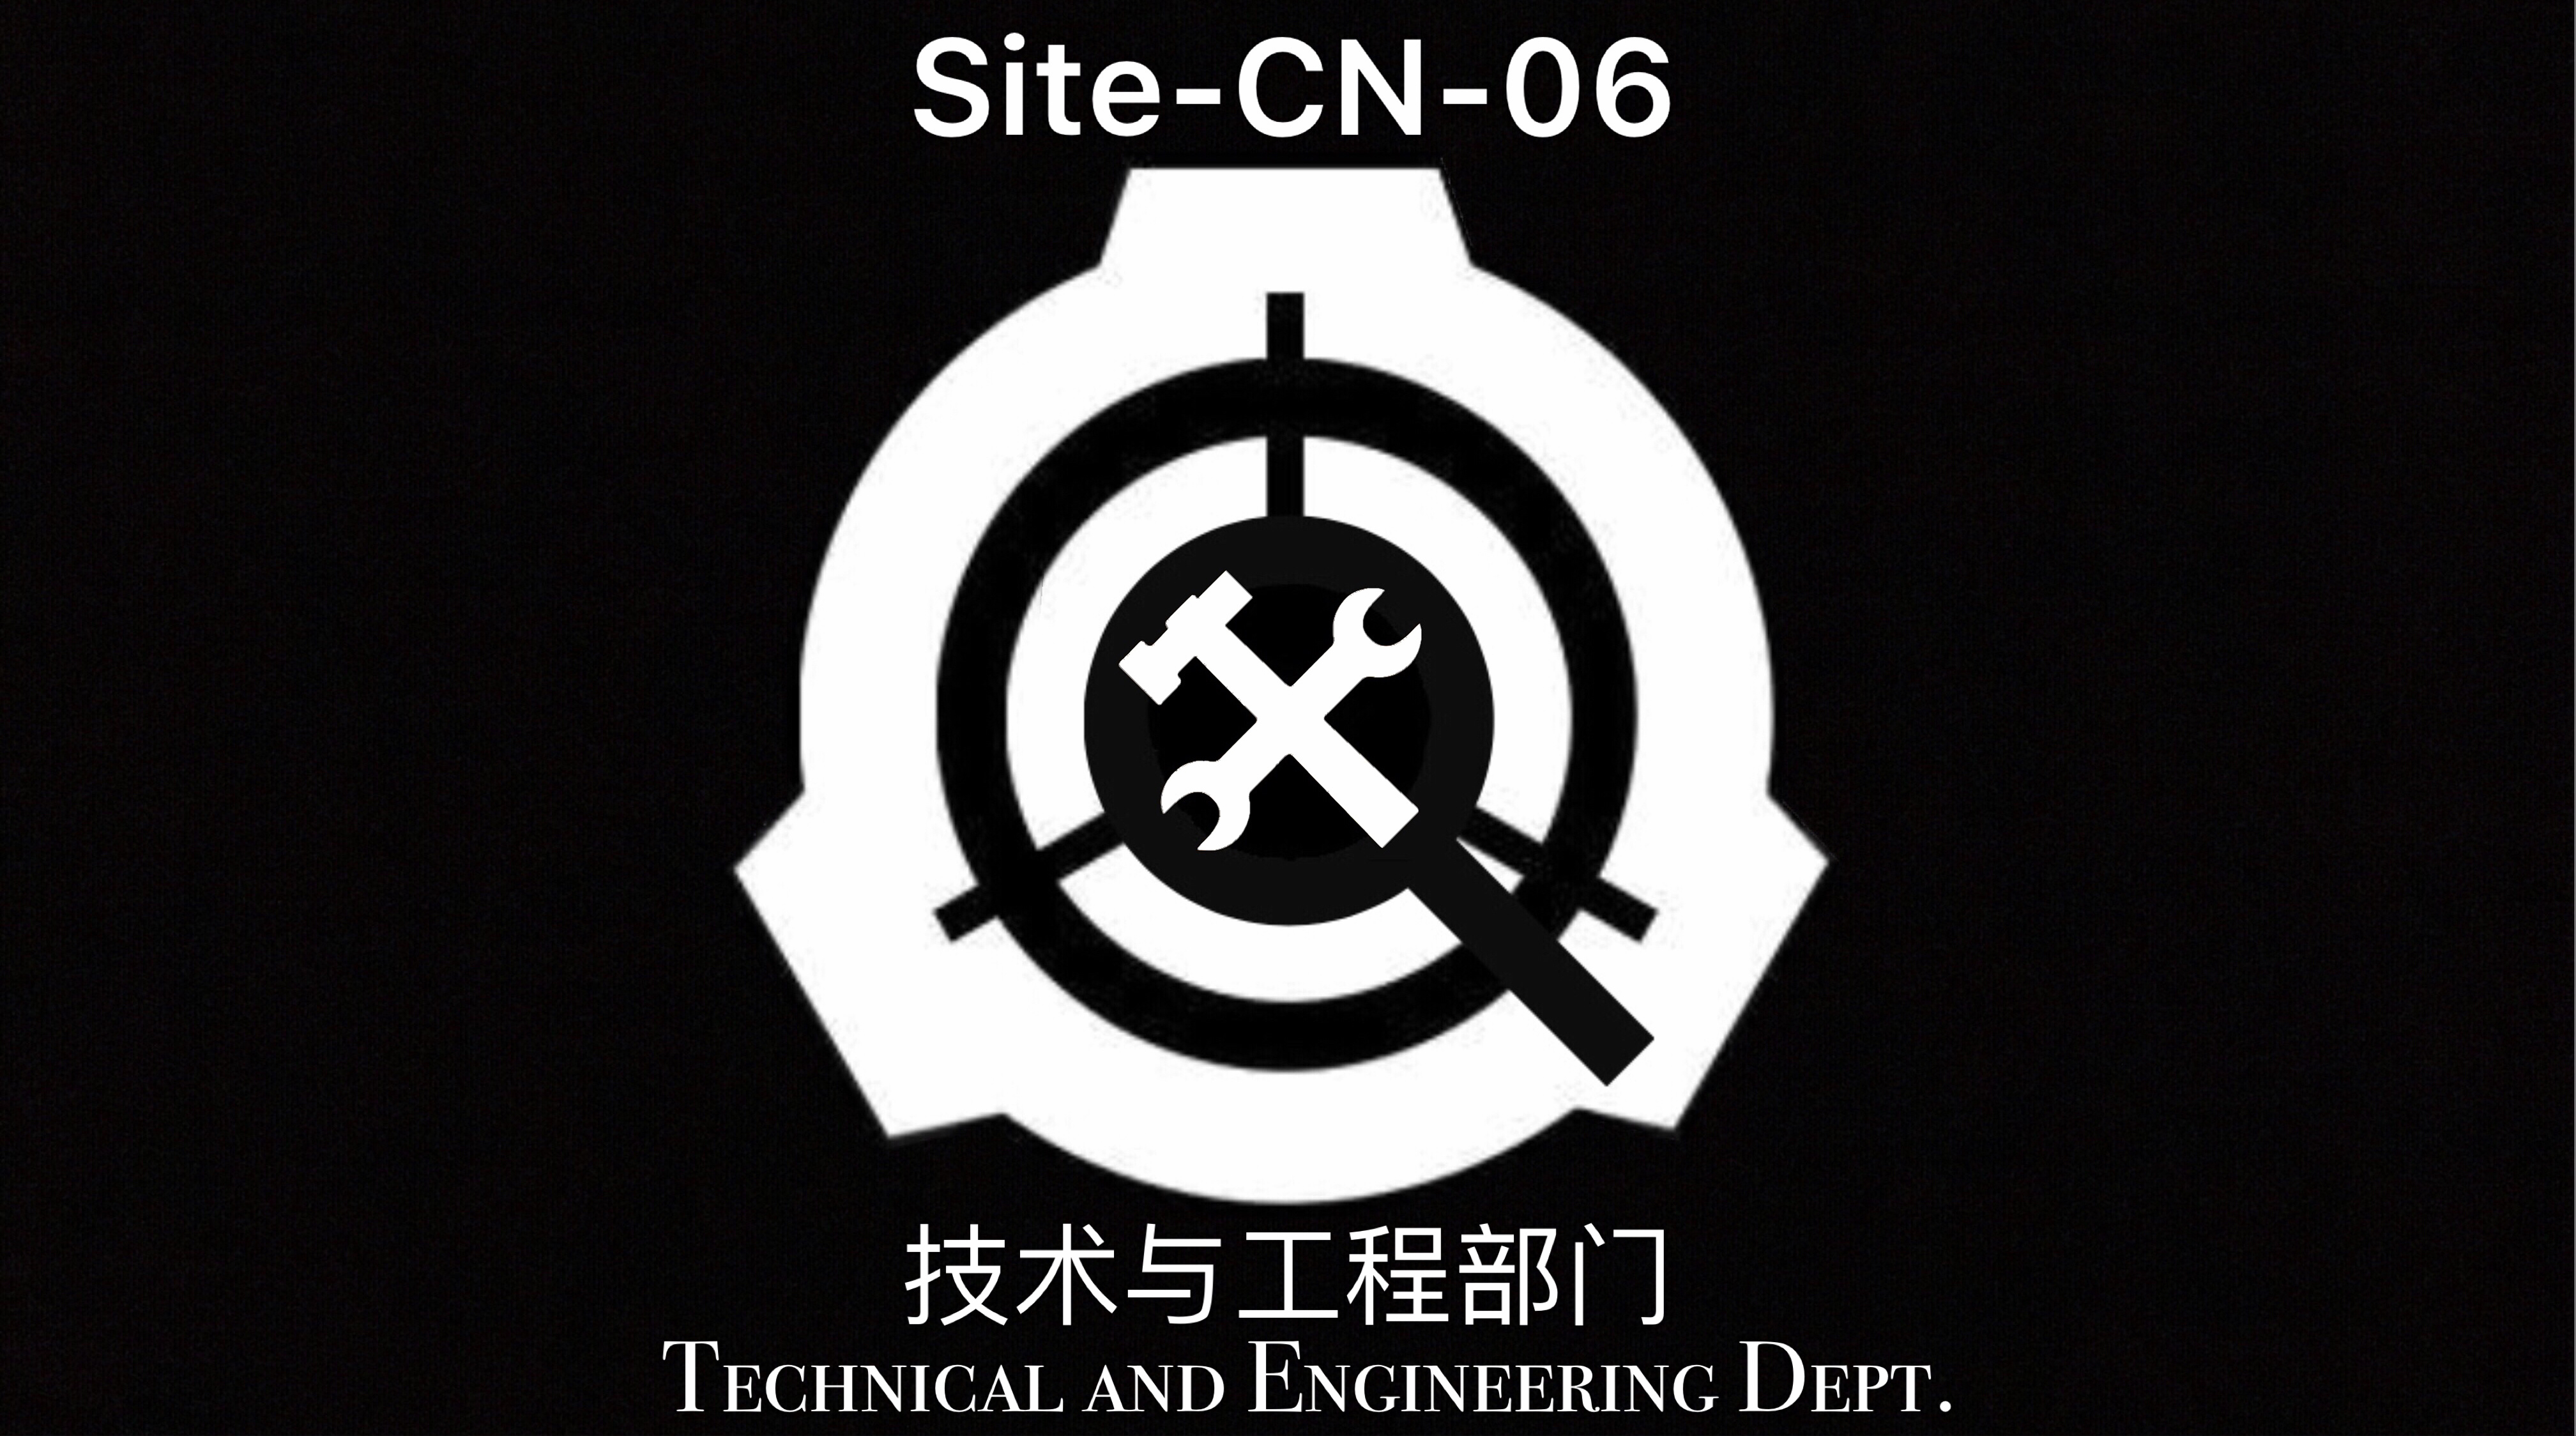 CY3LUx.jpg